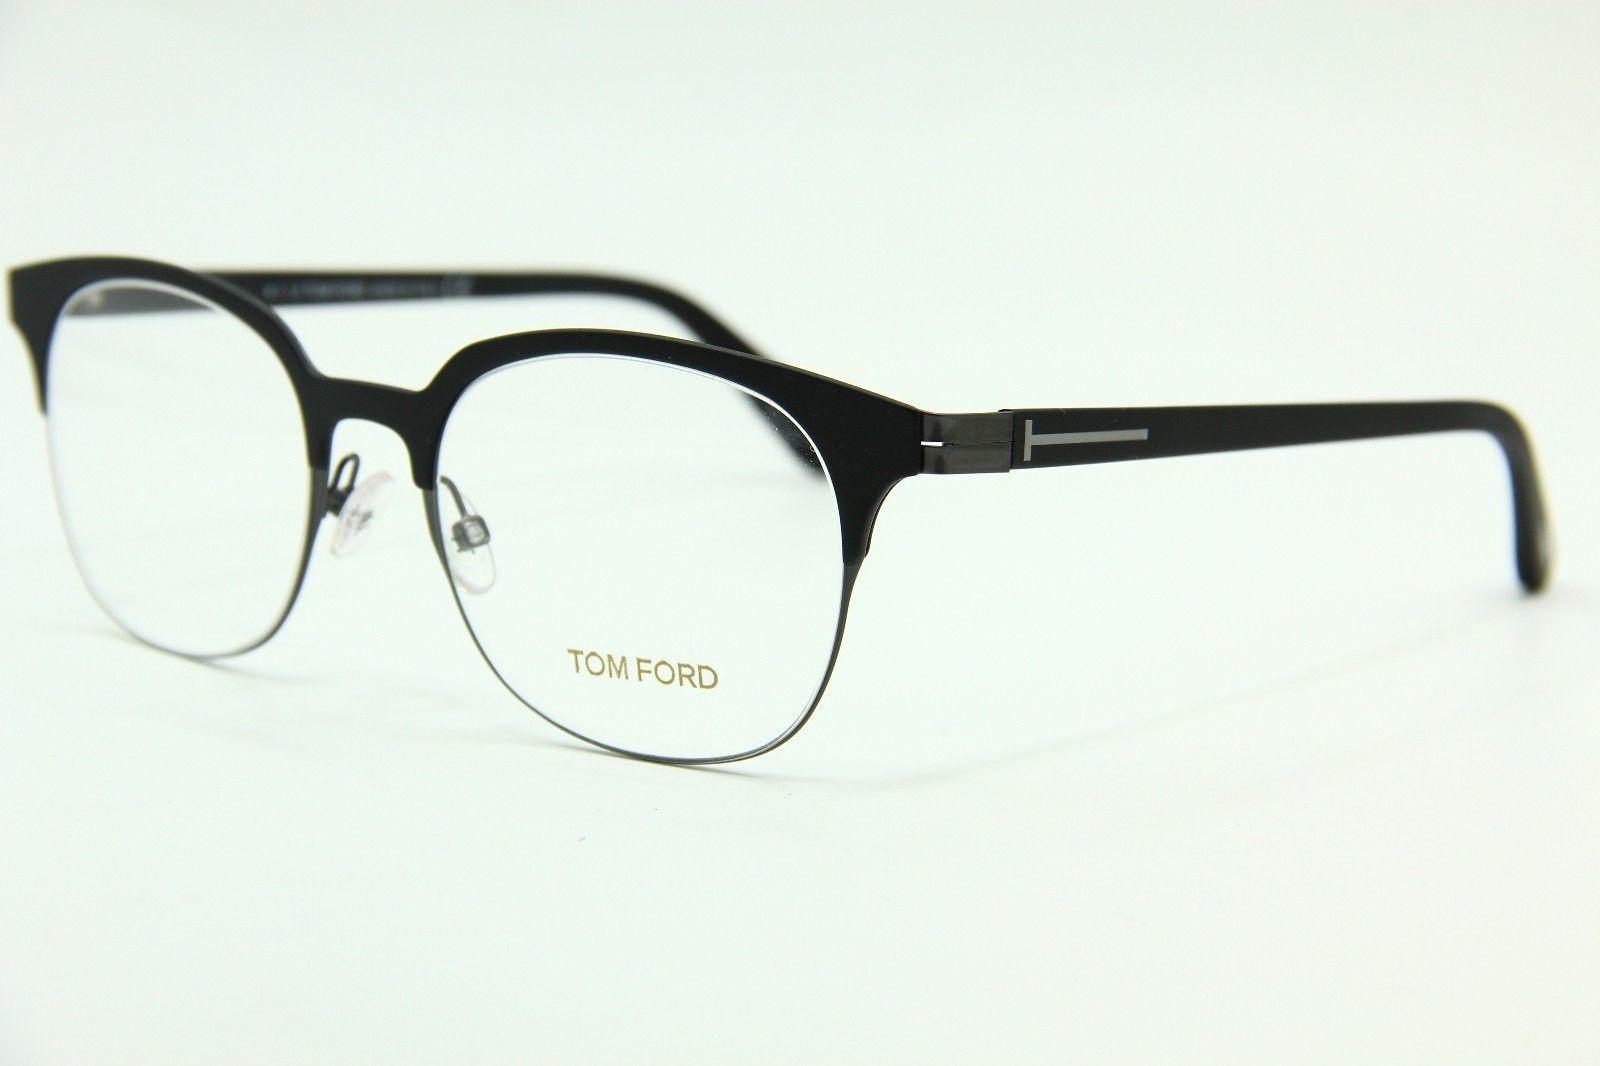 d67c626a8b New Tom Ford Tf 5347 001 Black Eyeglasses and 14 similar items. 57